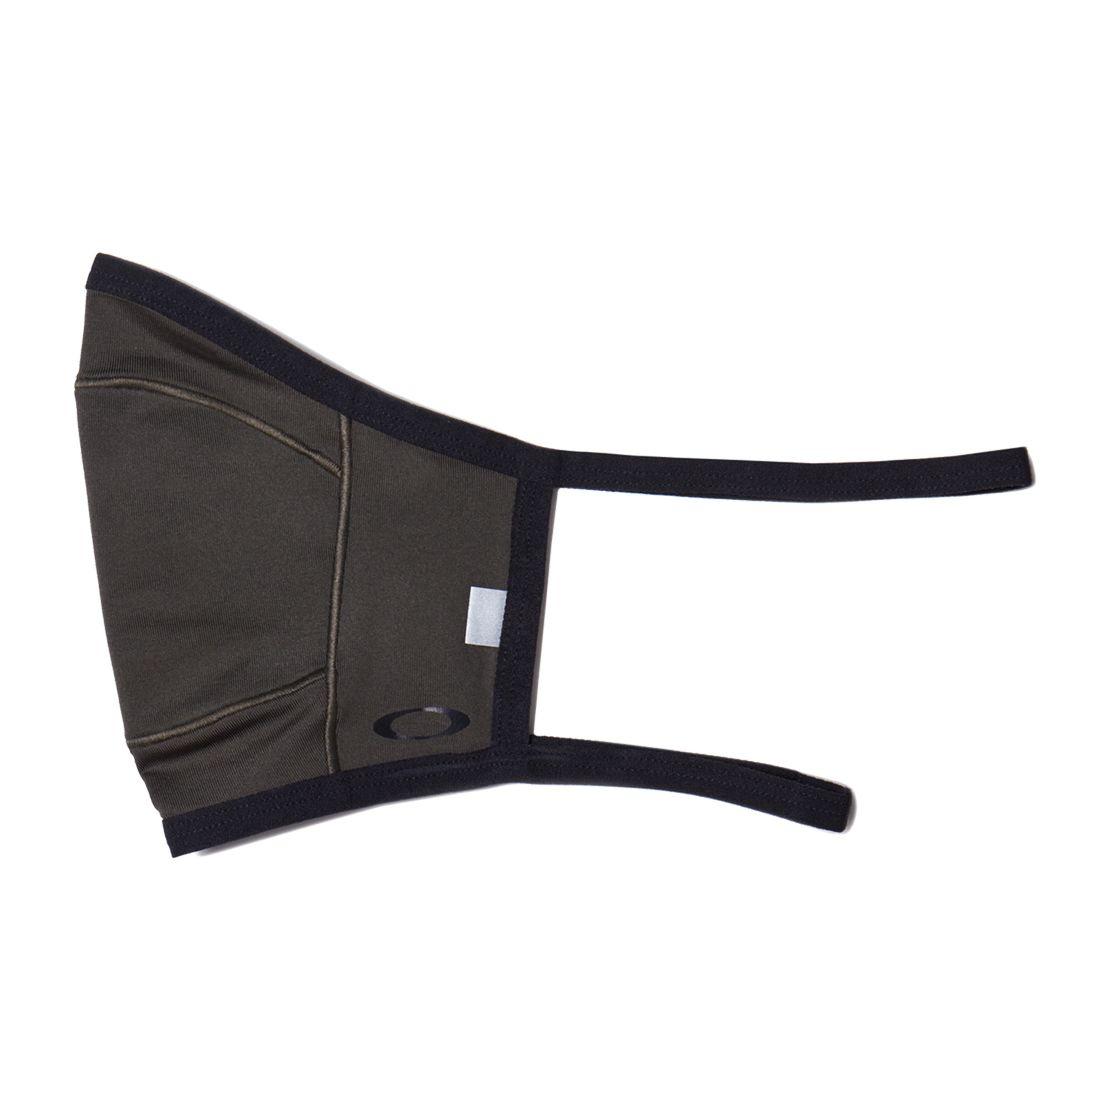 Oakley Maszk Fitted Lite - S/M - New Dark Brush